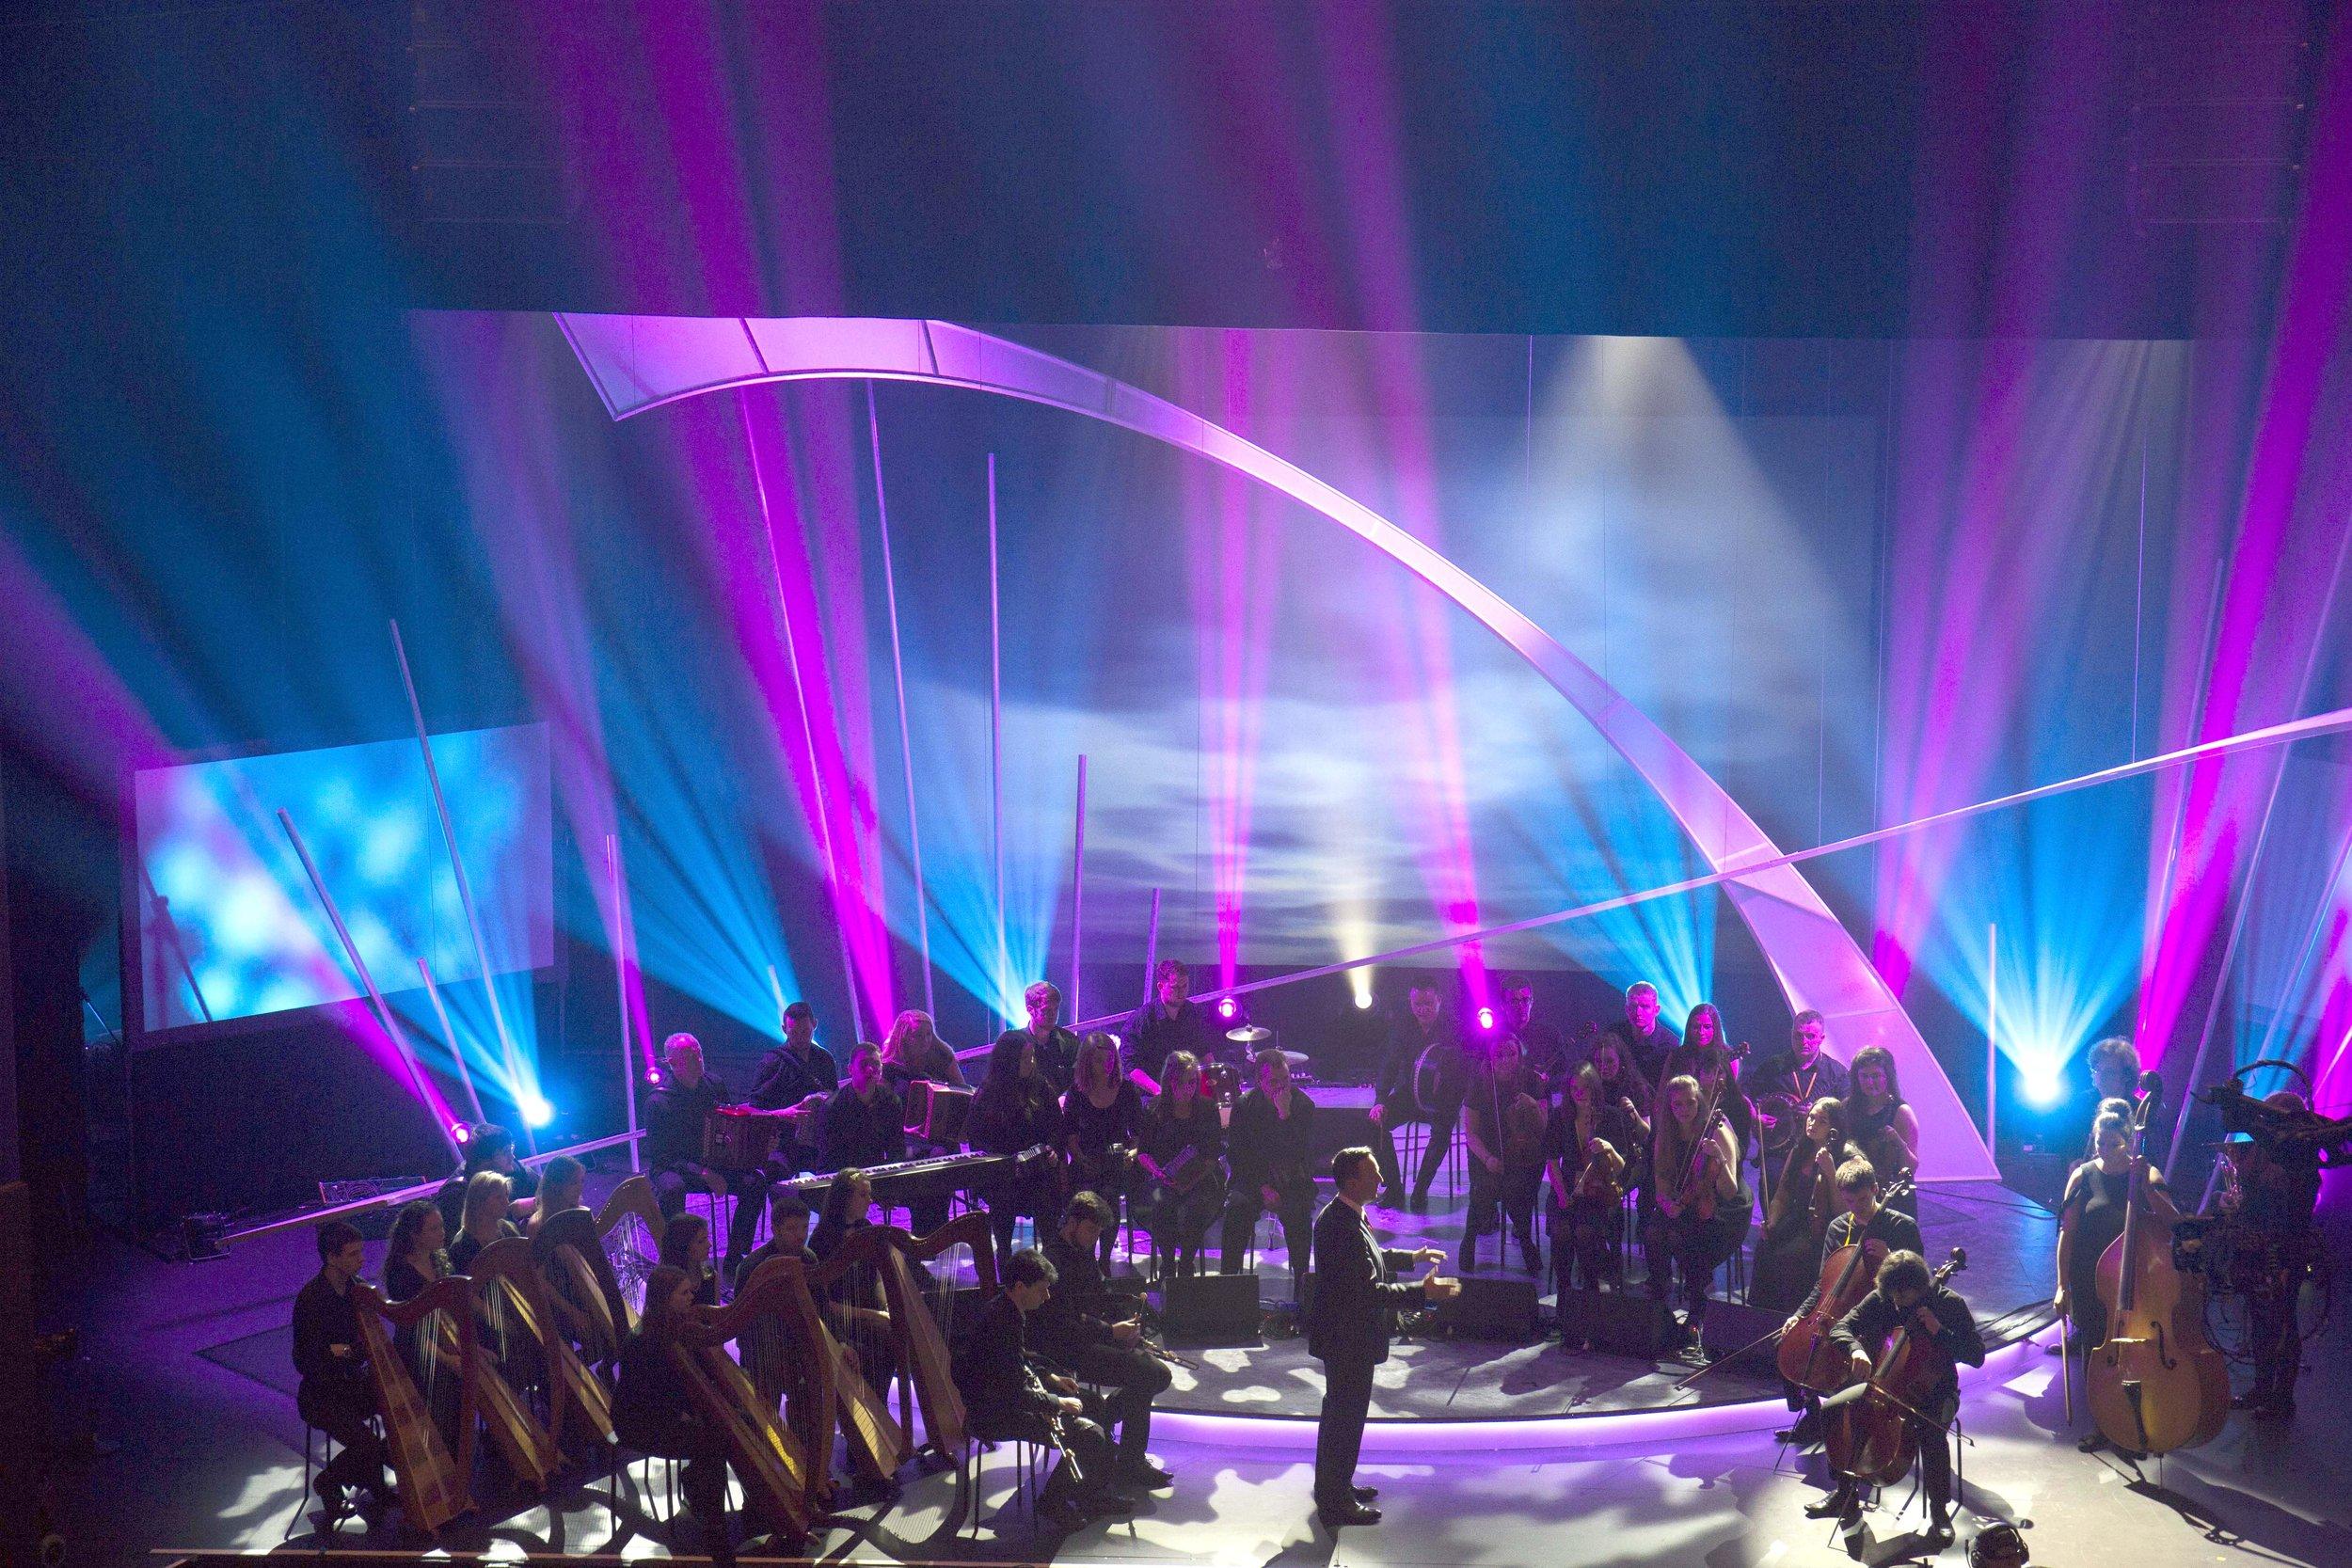 Orchestra at start of piece.jpg